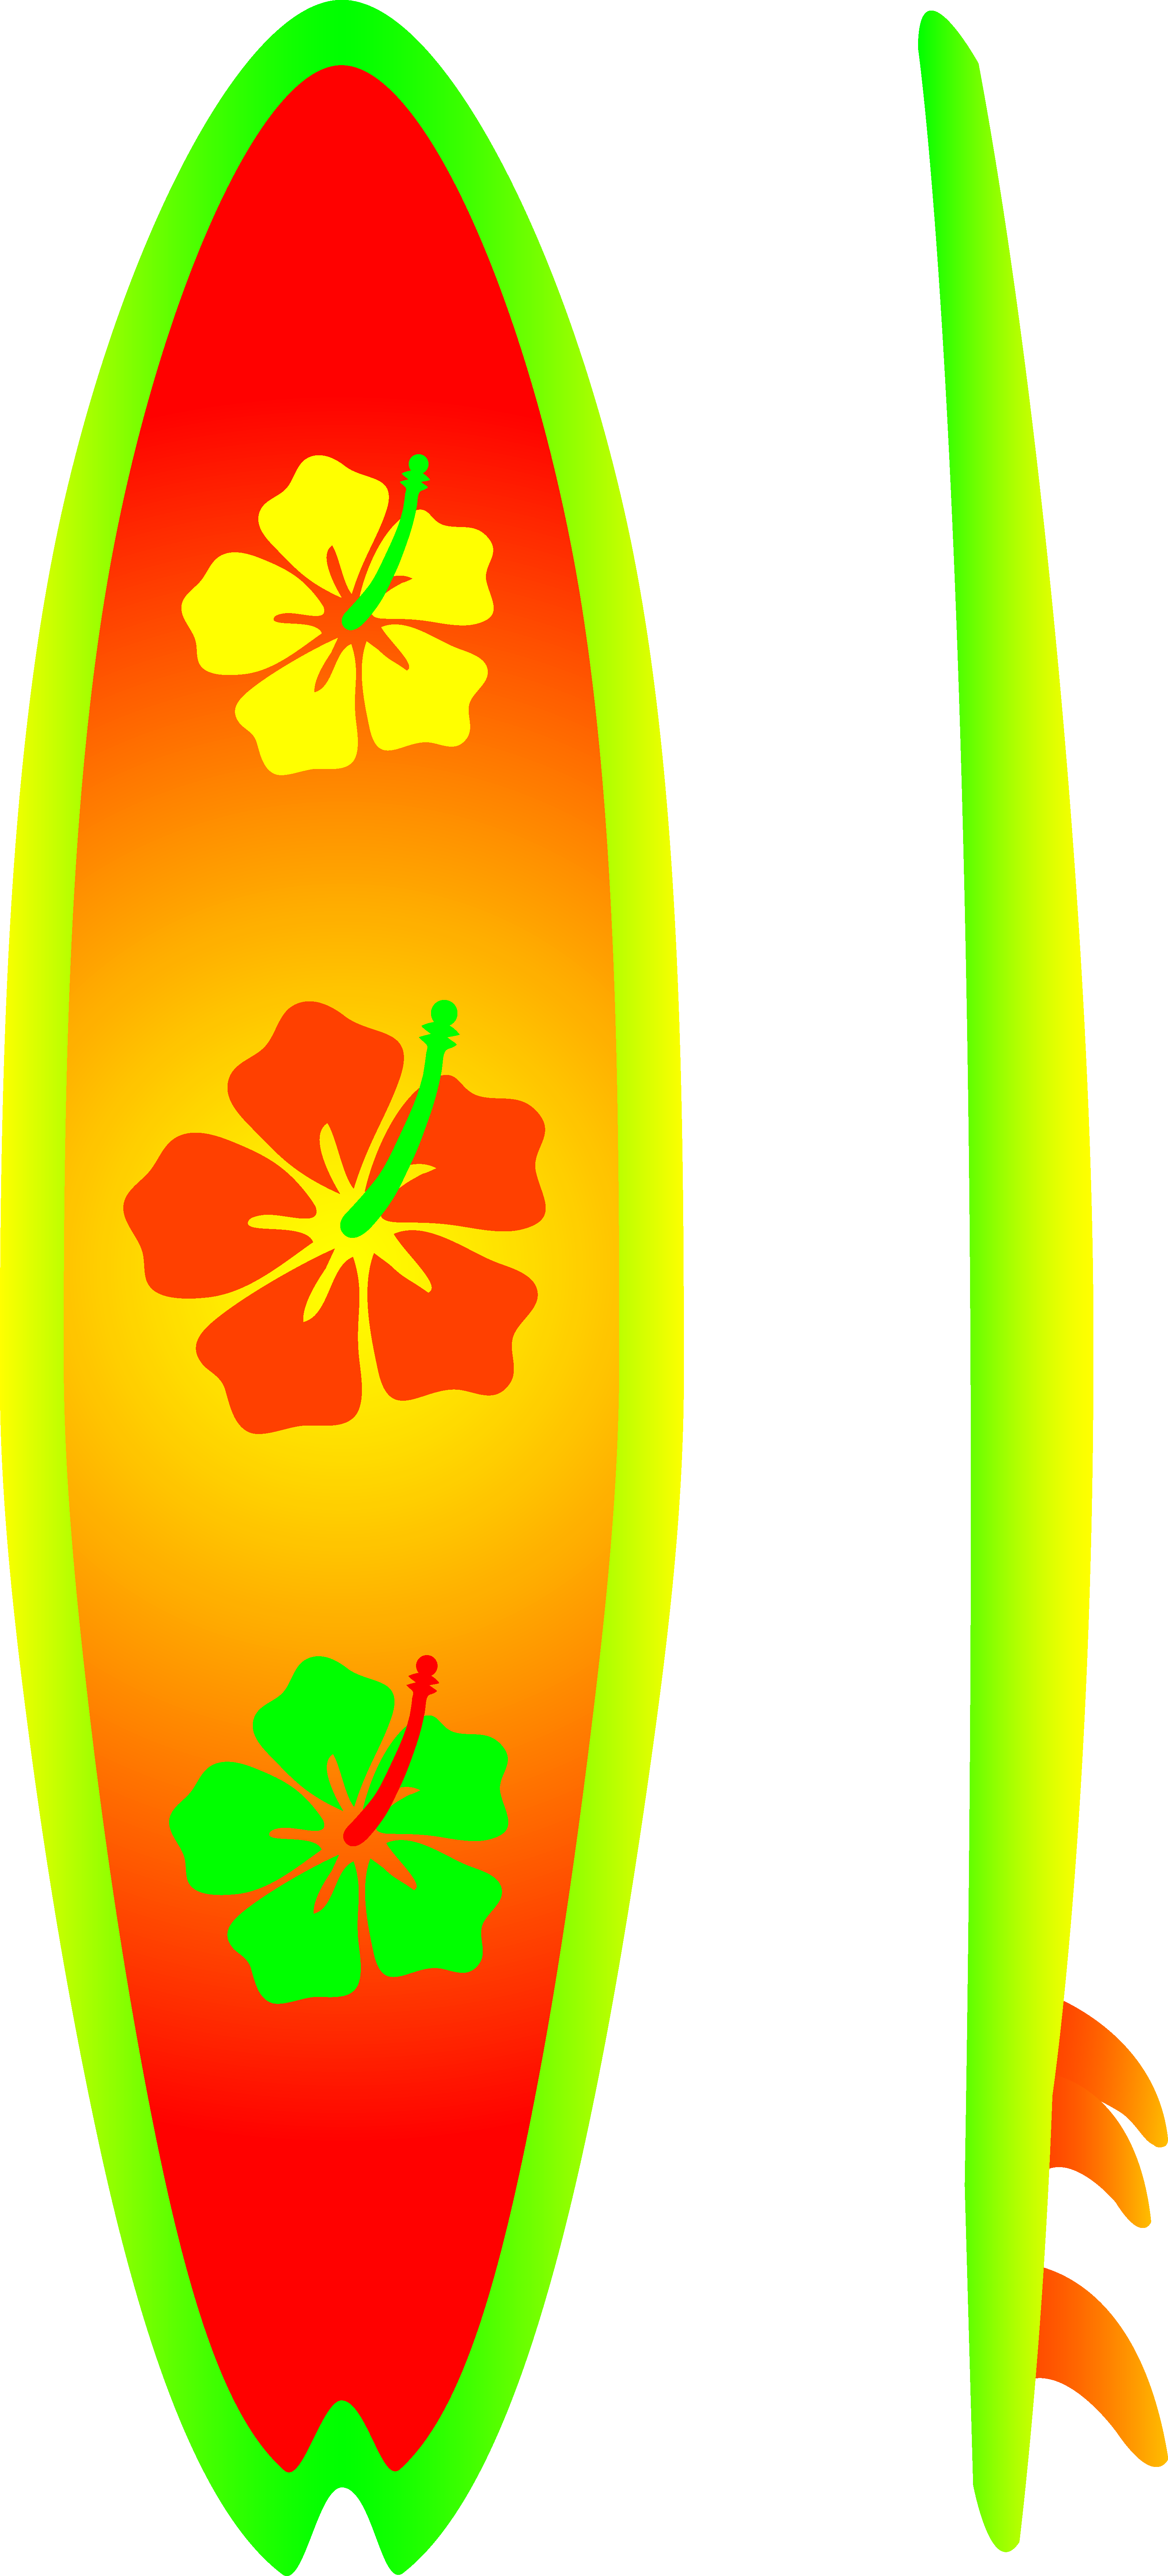 Surfboard Clipart-surfboard clipart-8